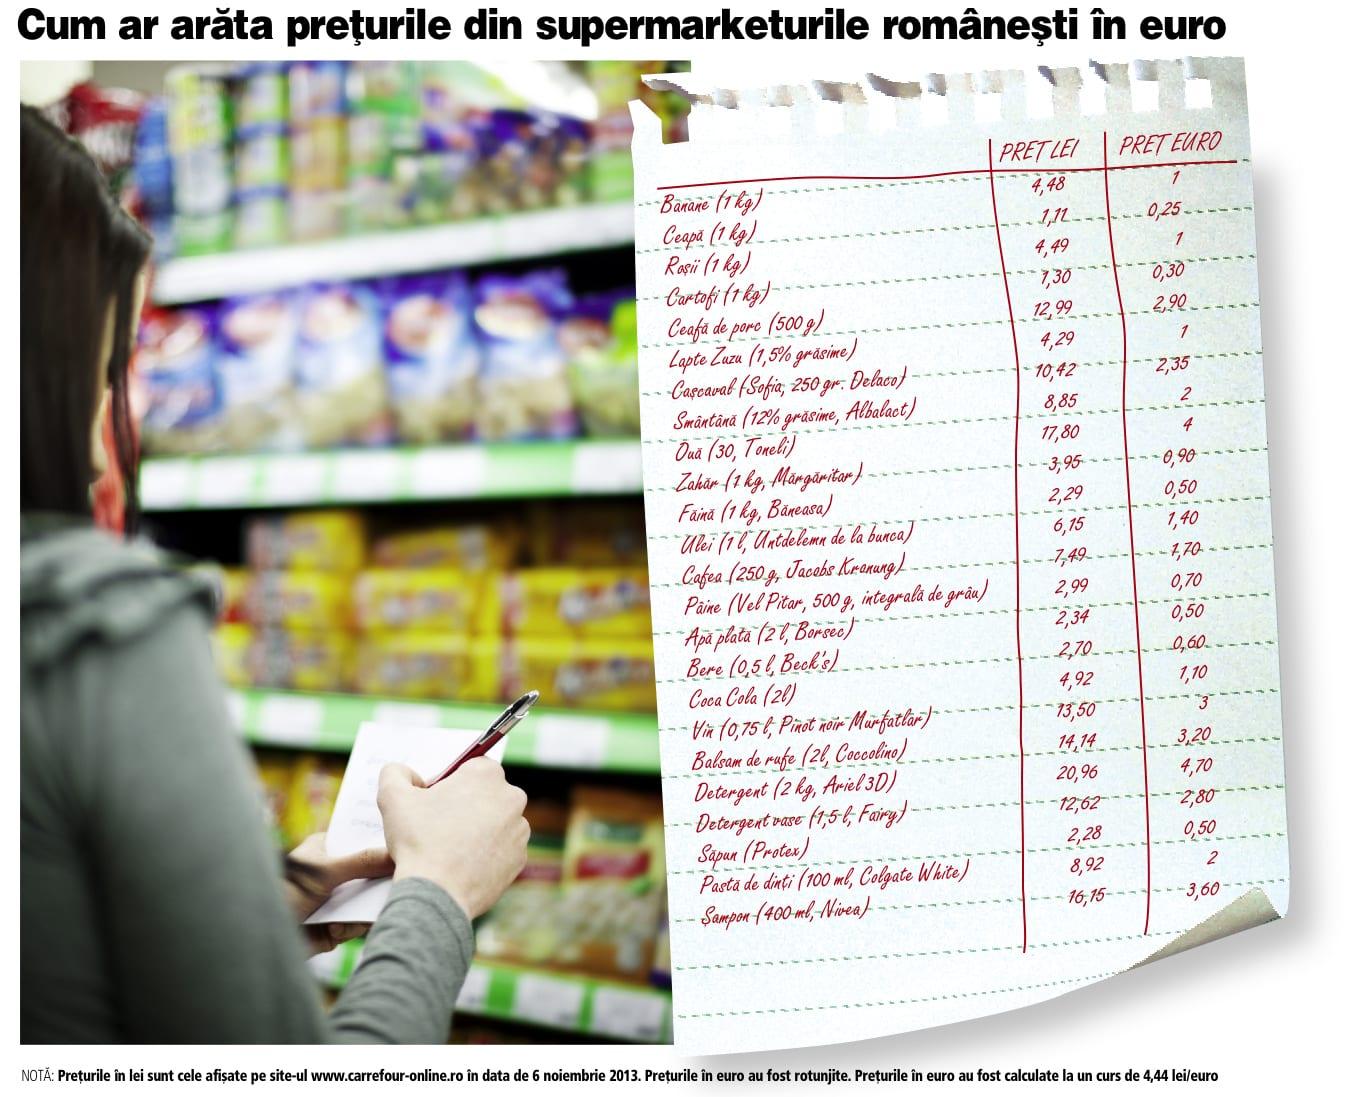 Preturile In lei sau in euro